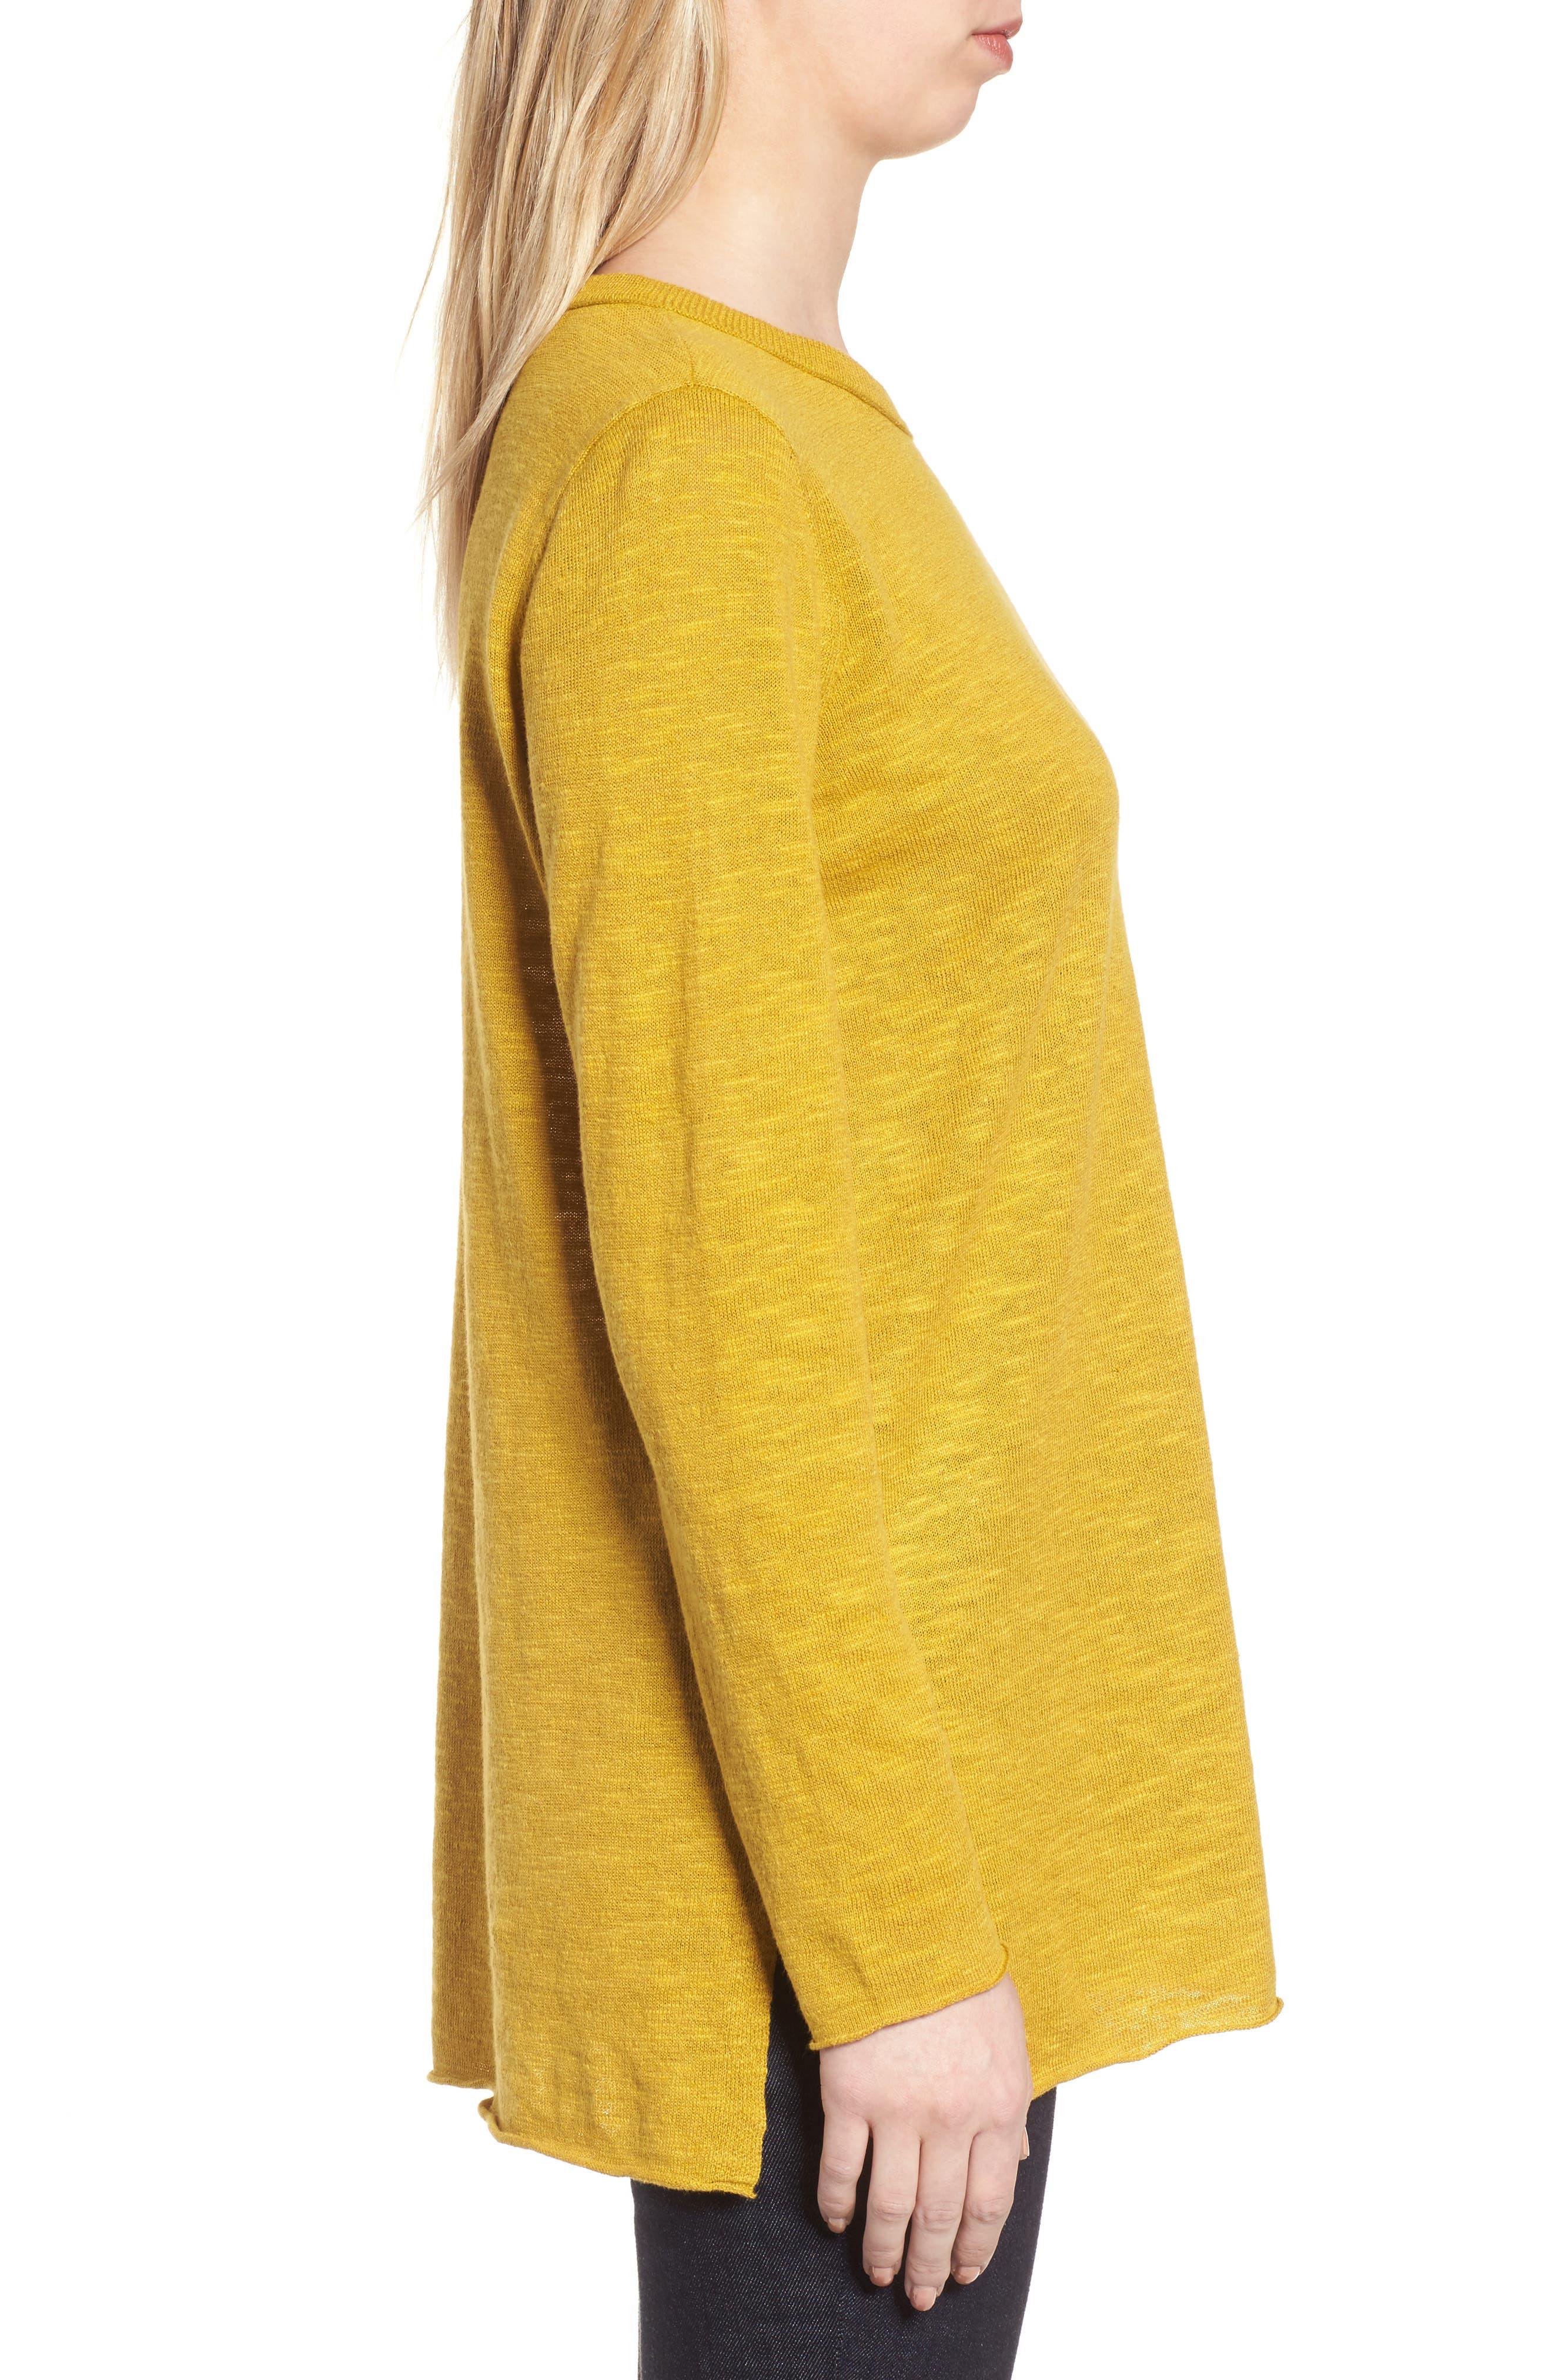 Organic Knit Crewneck Tunic Top,                             Alternate thumbnail 3, color,                             750